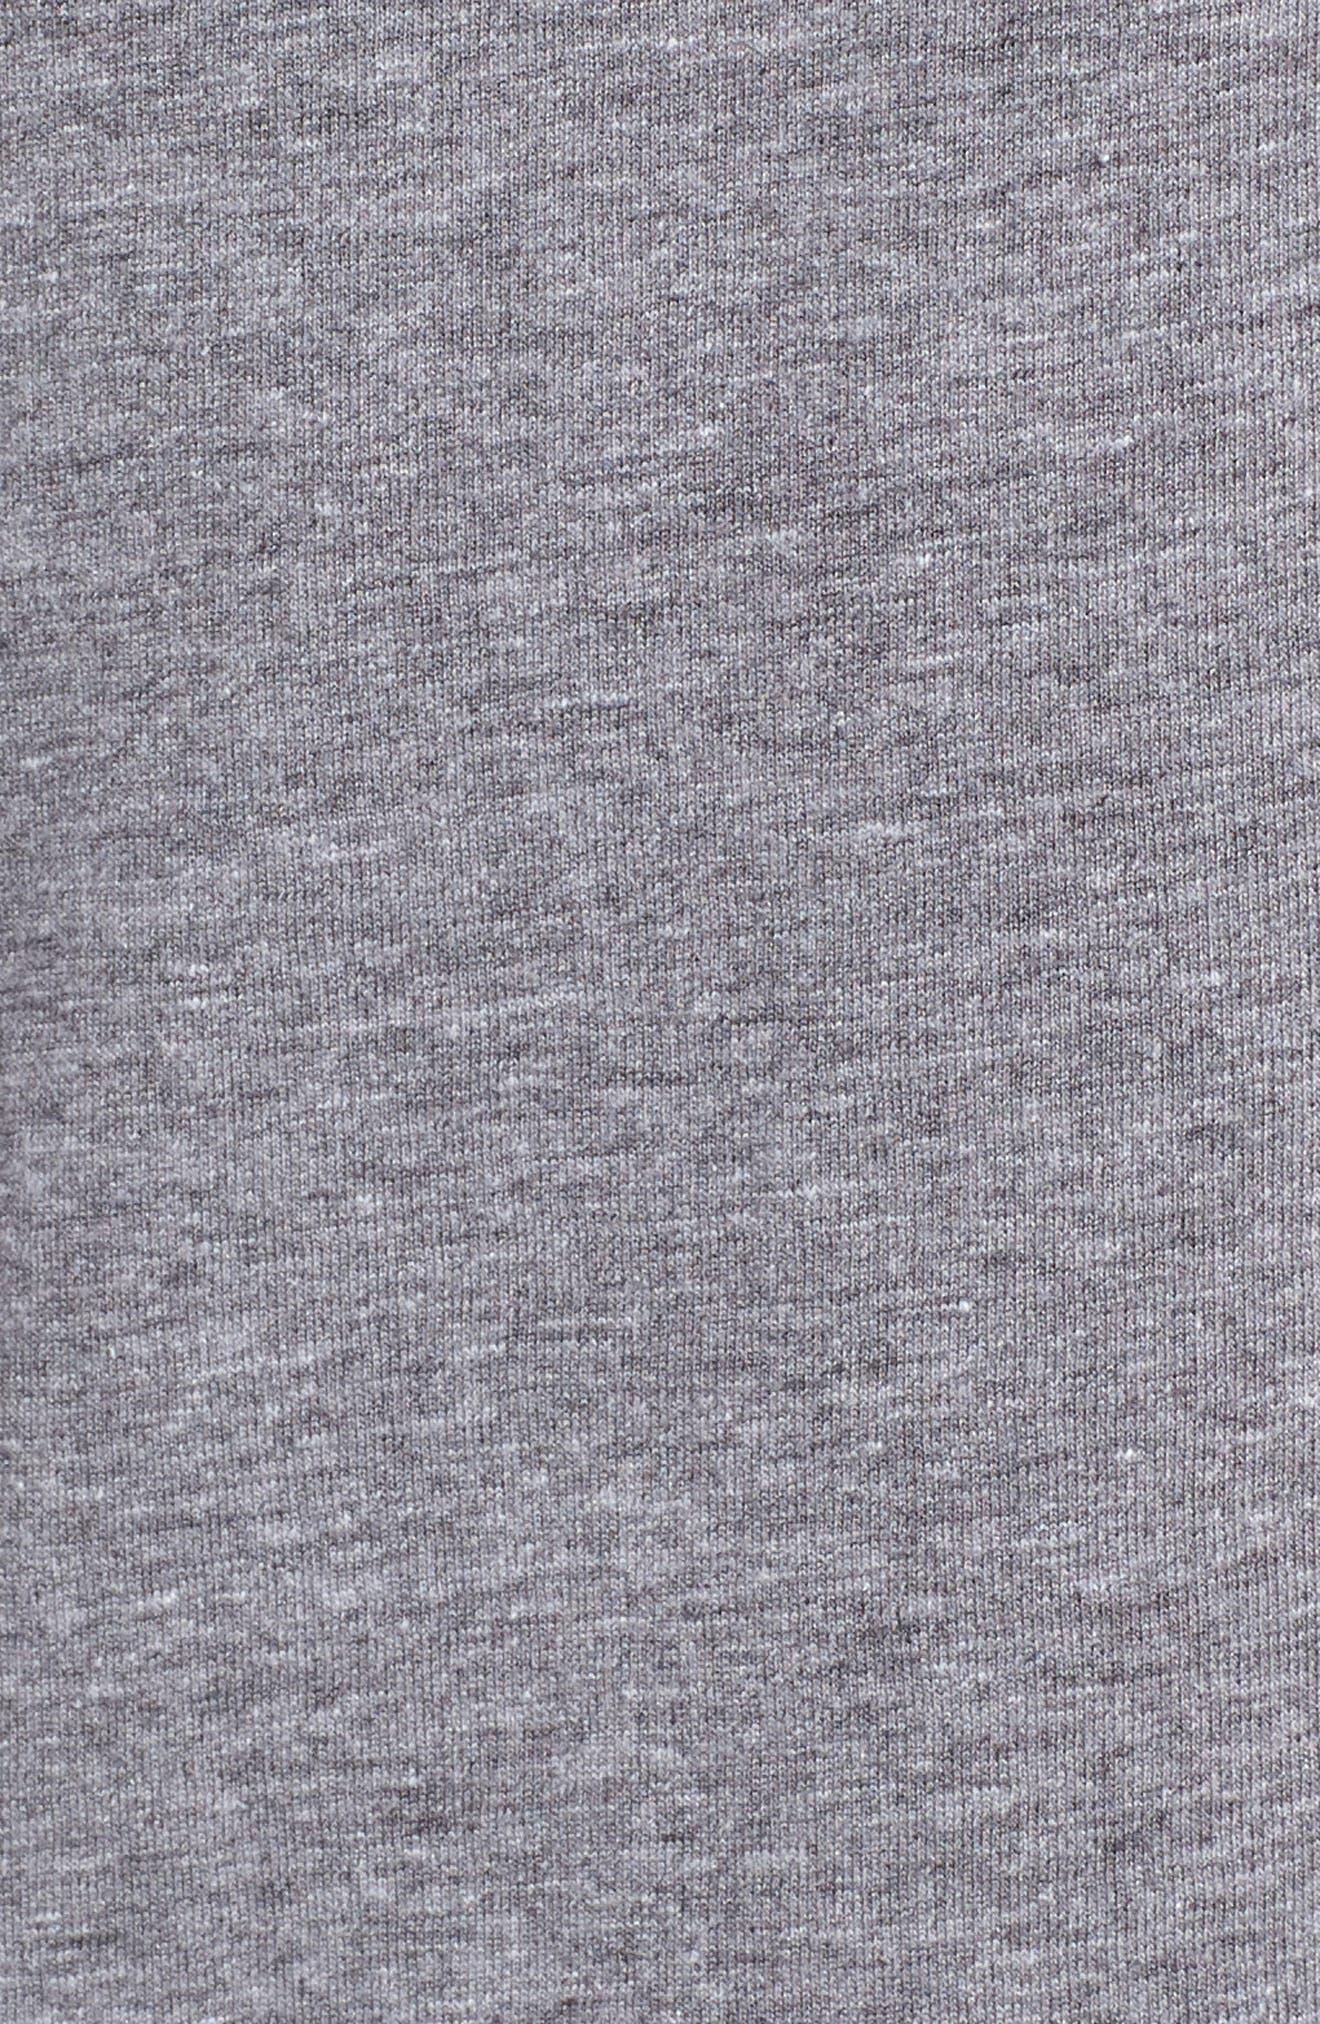 Jolt T-Shirt,                             Alternate thumbnail 5, color,                             HEATHER GREY/ WHITE